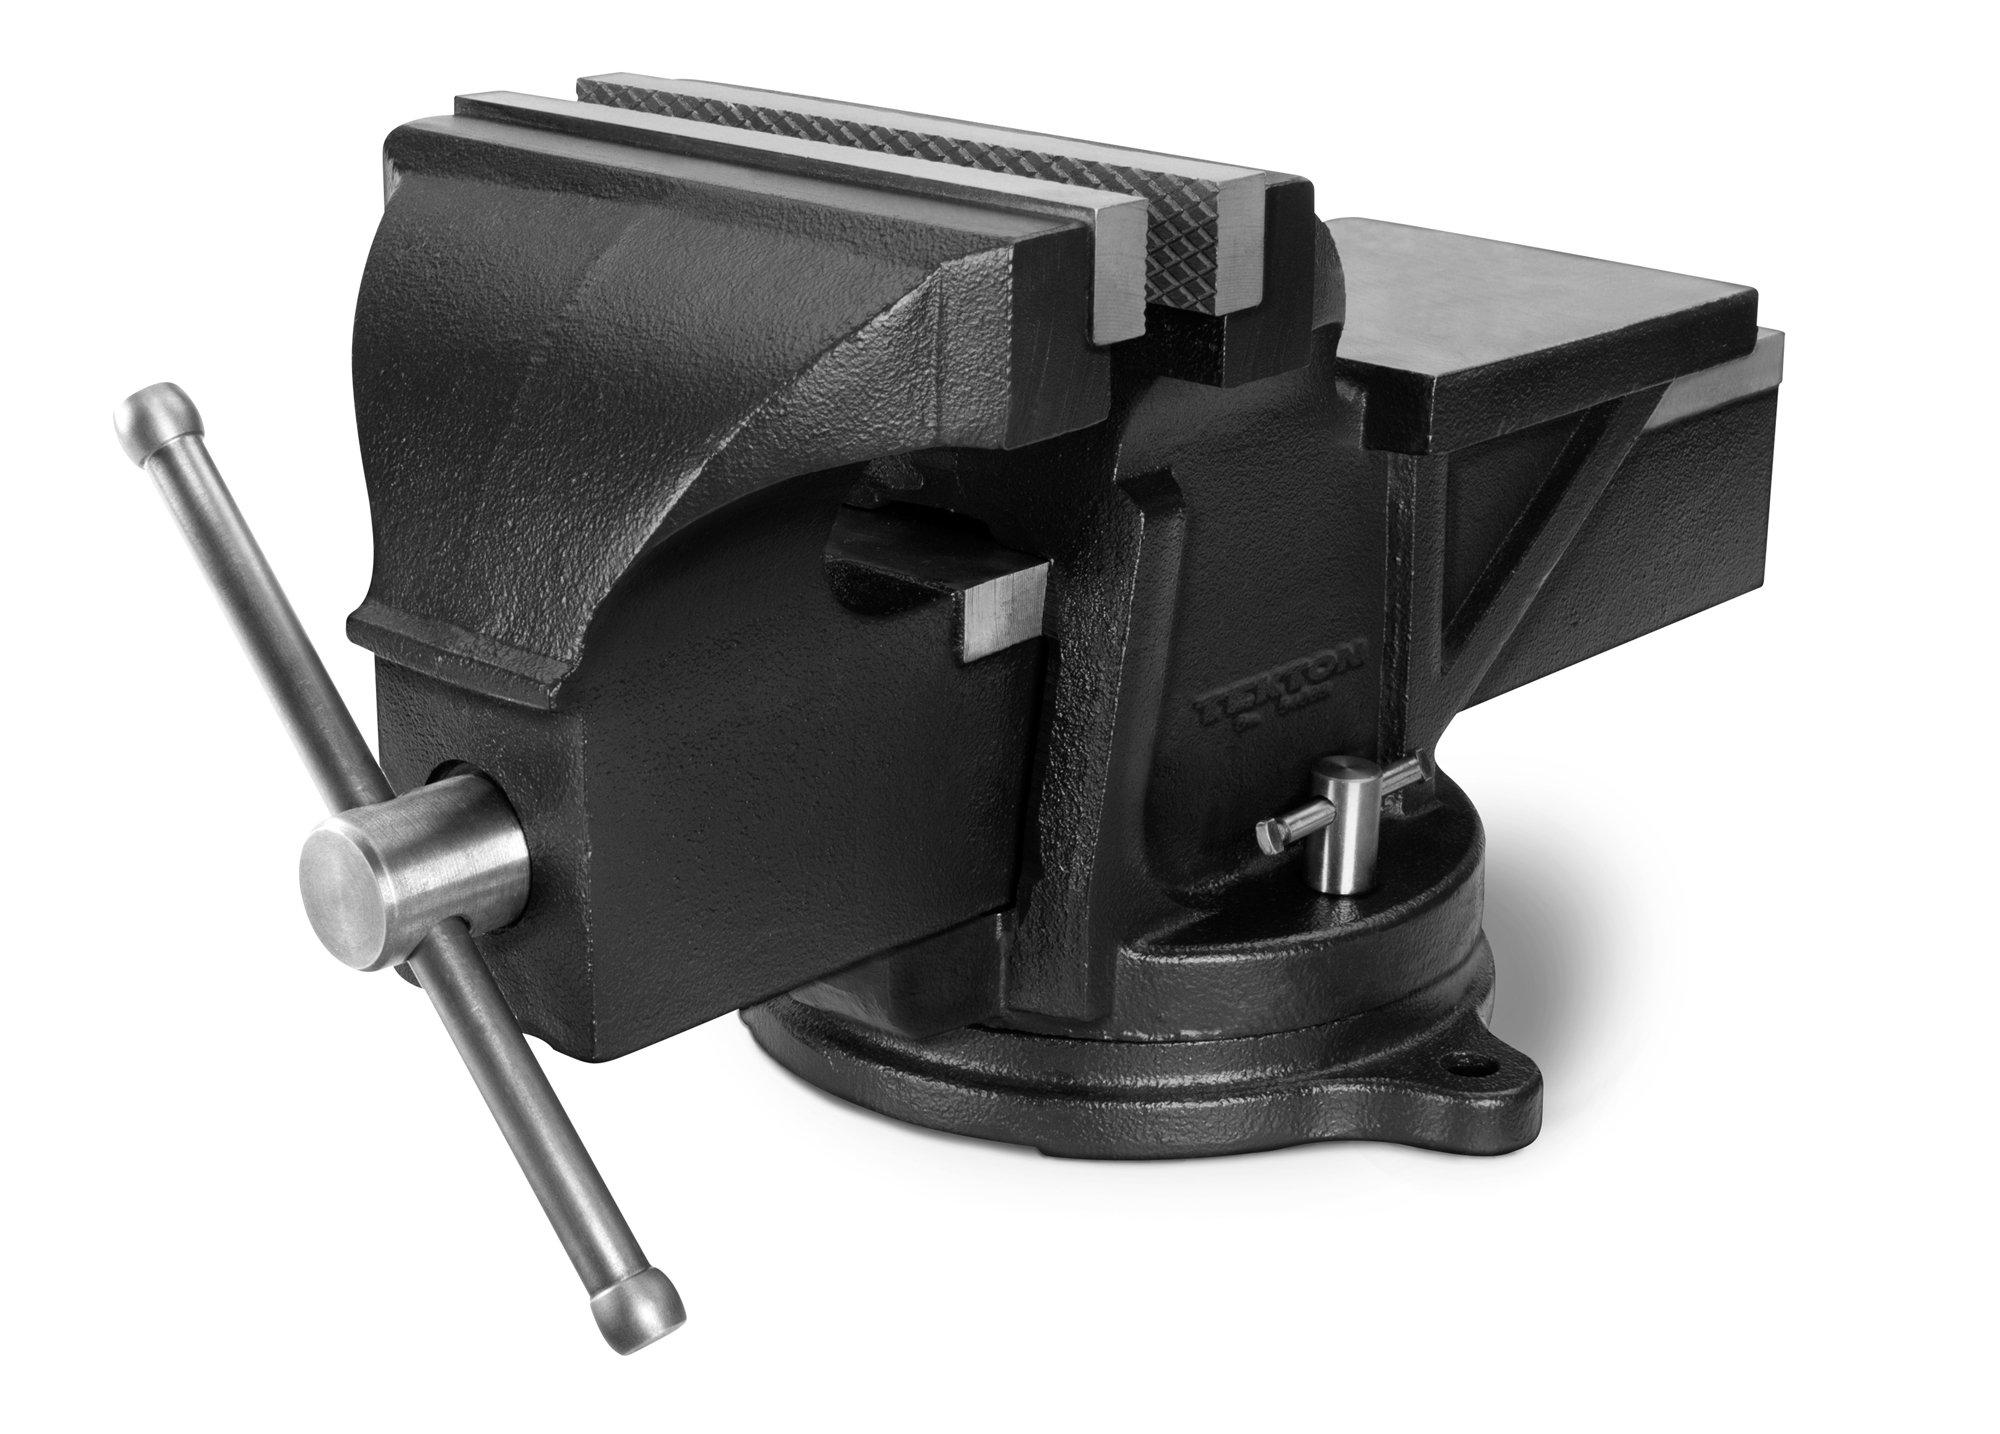 TEKTON 8-Inch Swivel Bench Vise | 54008